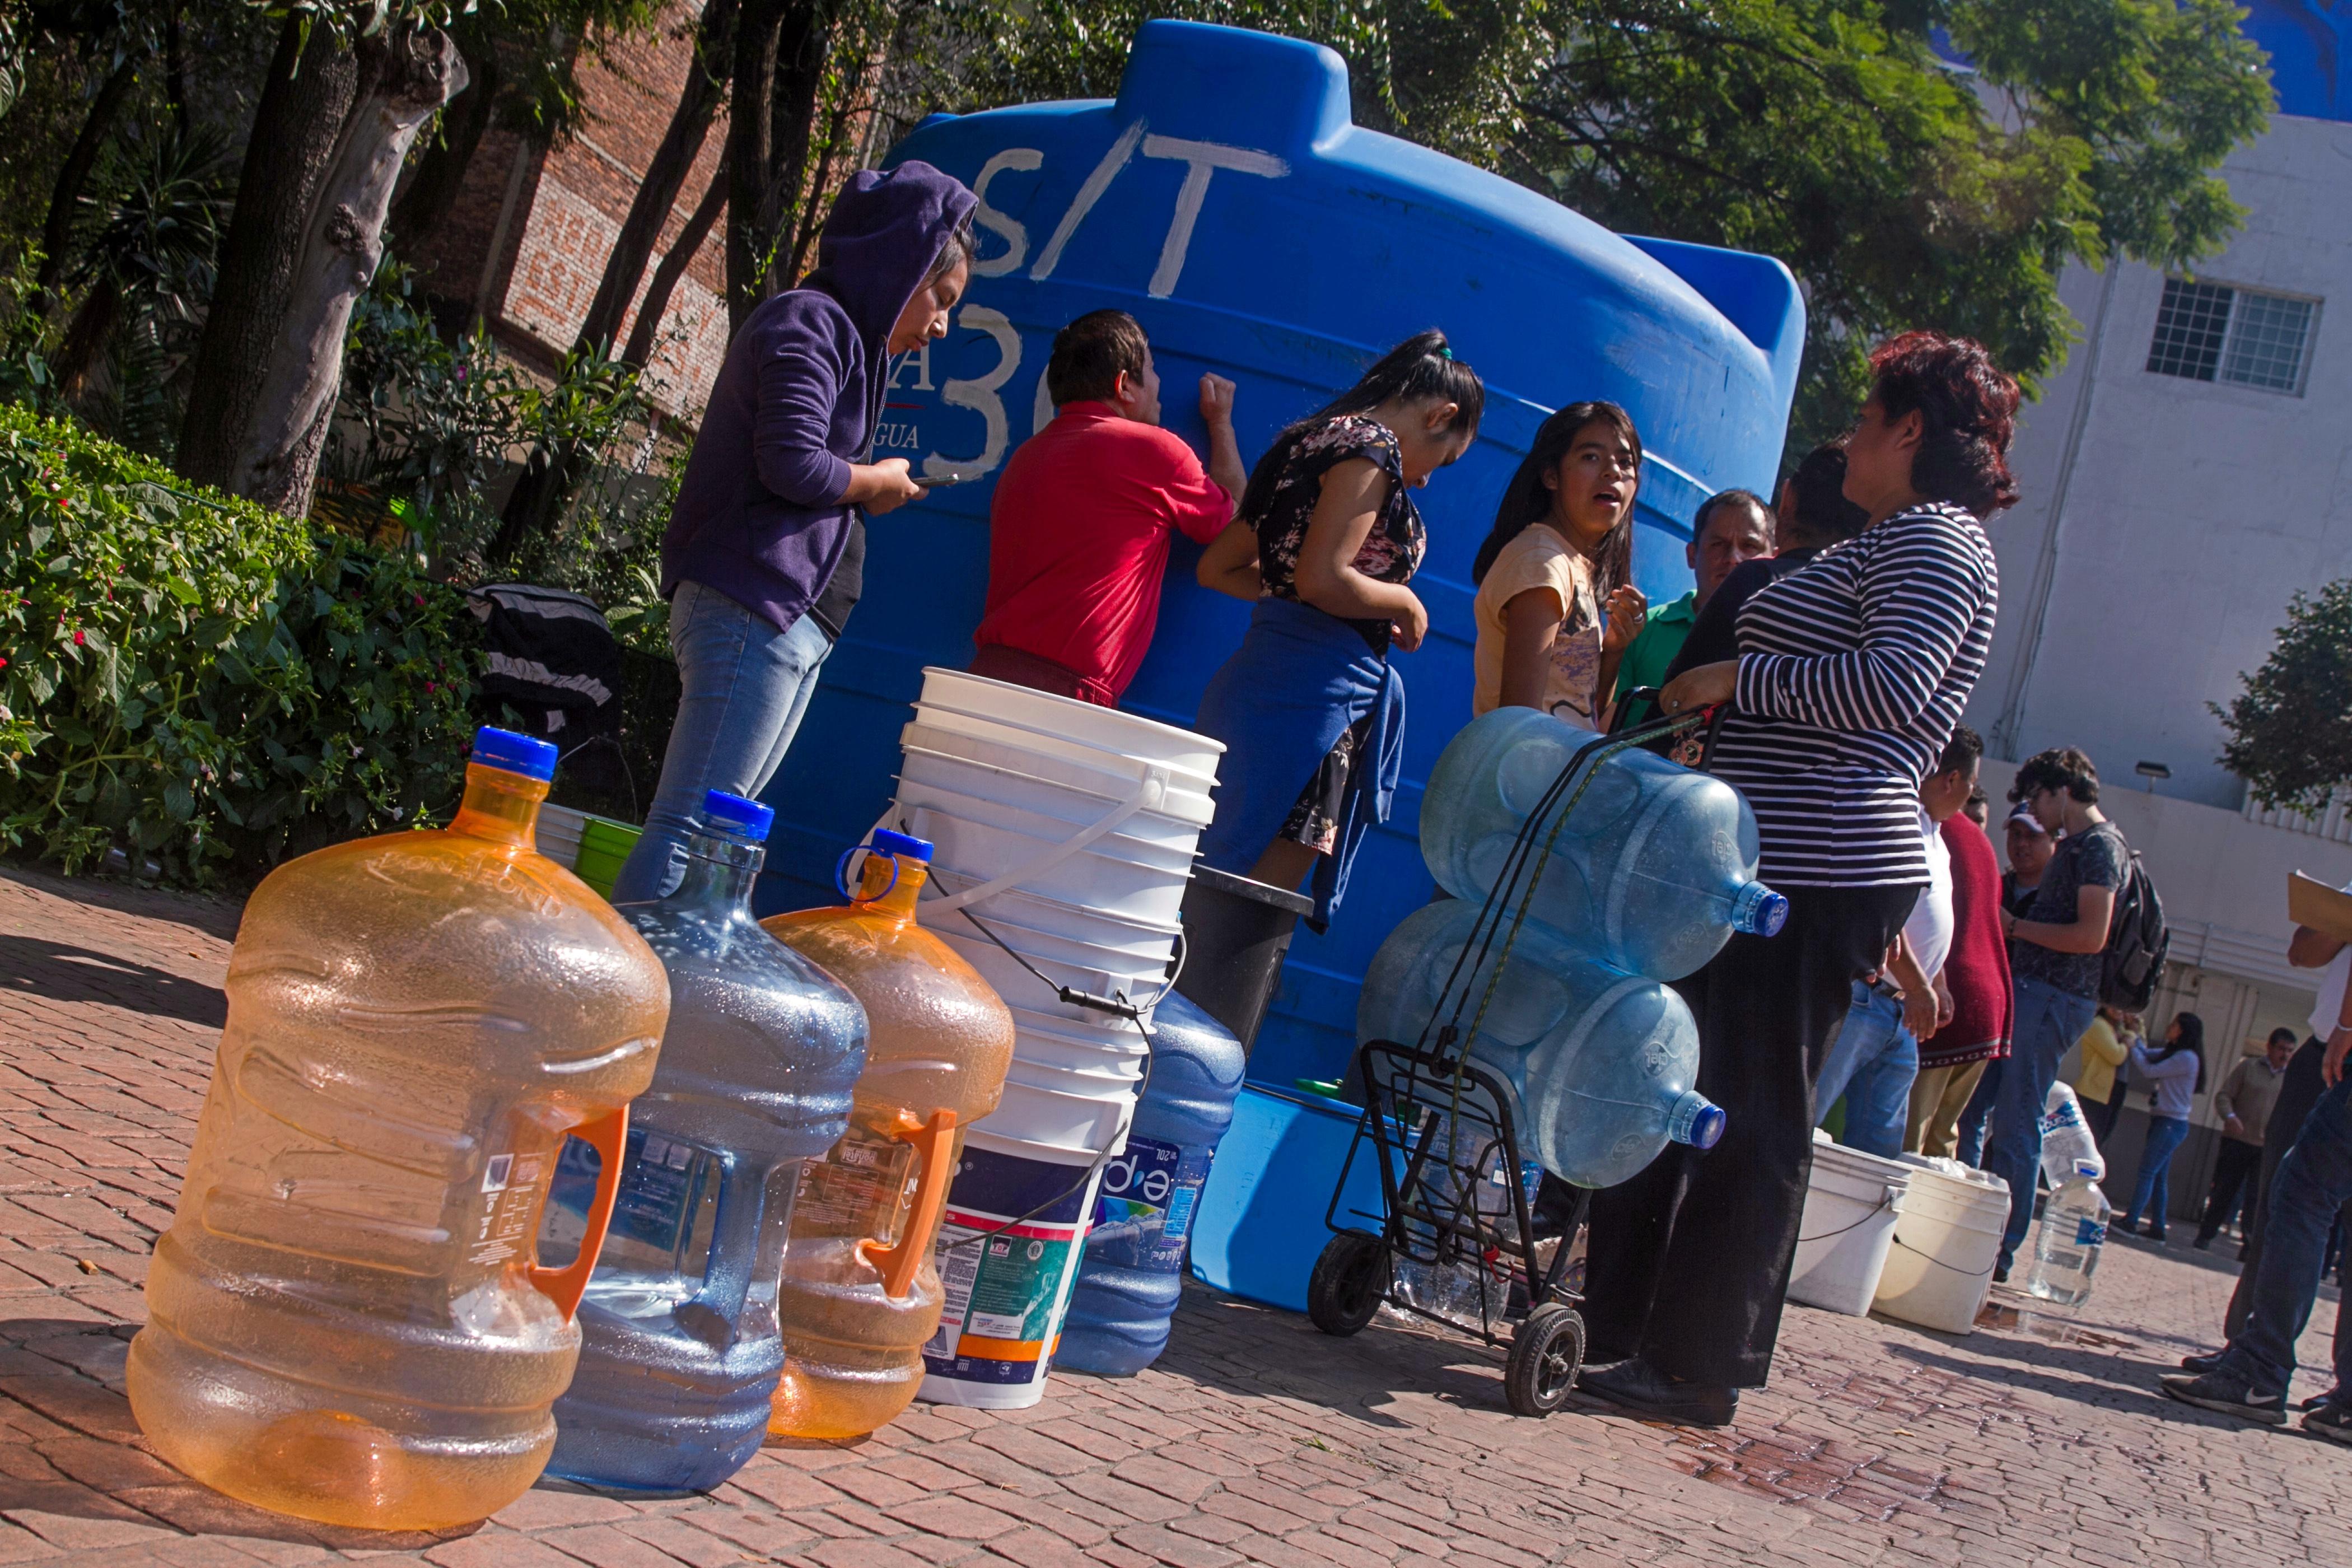 CDMX: 3 de cada 10 tienen problemas de escasez de agua